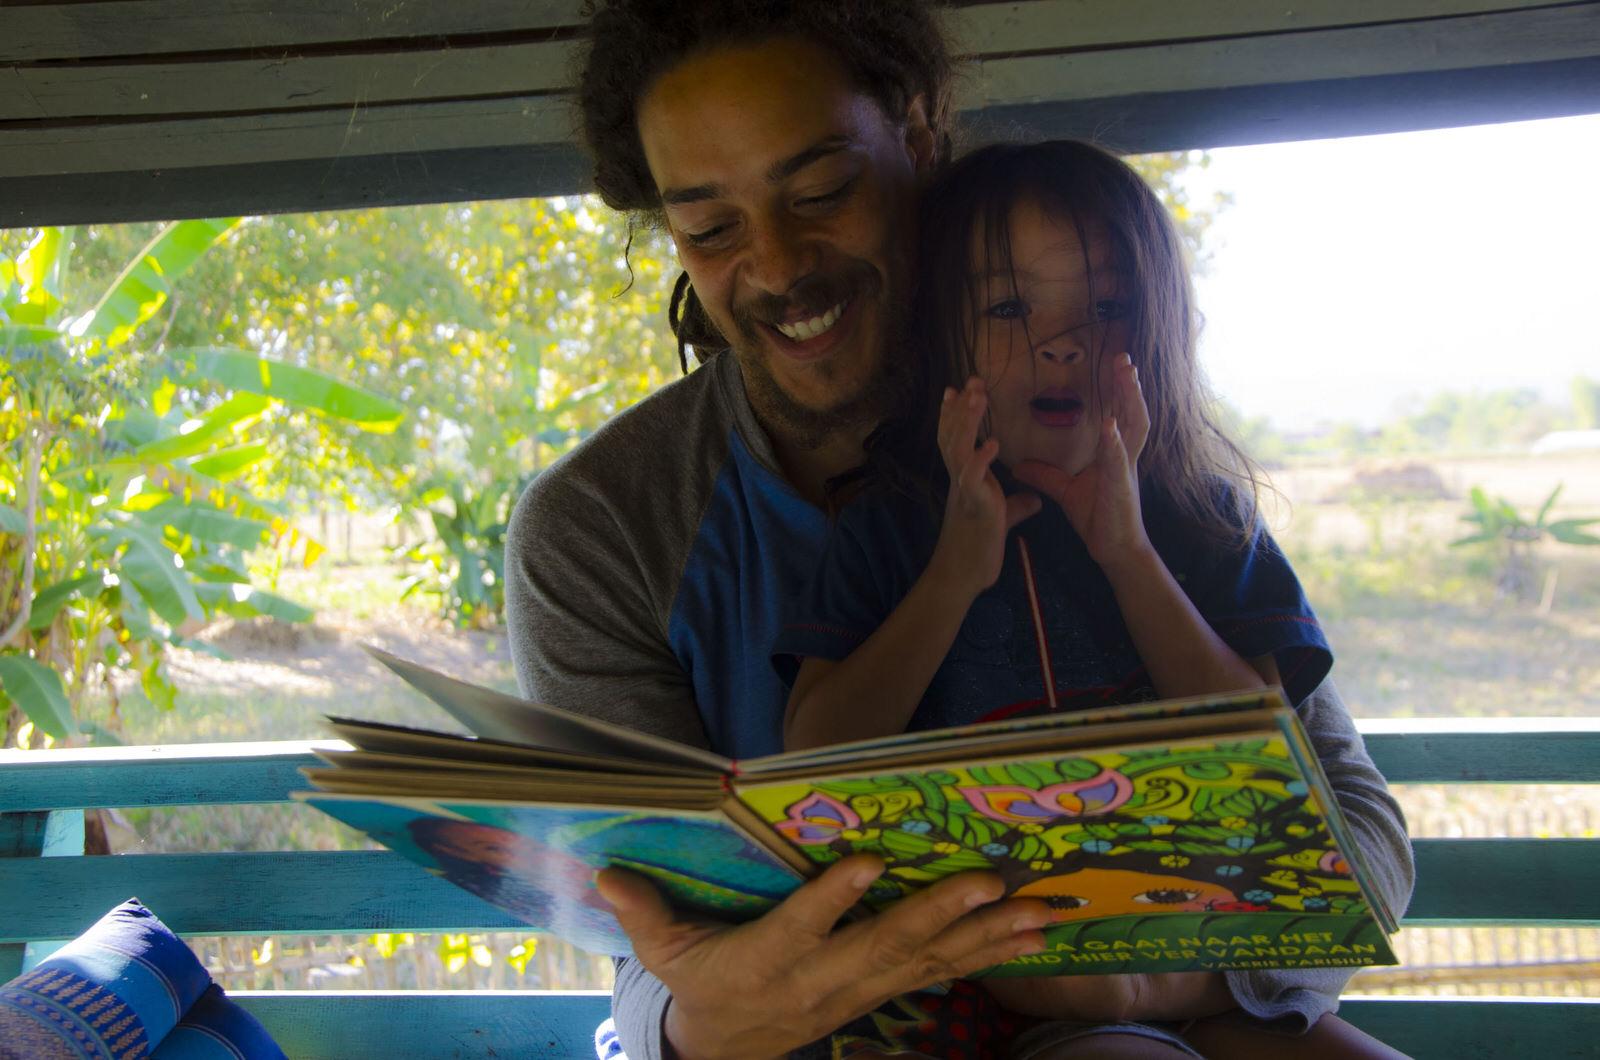 fatherdaughterbook.jpg